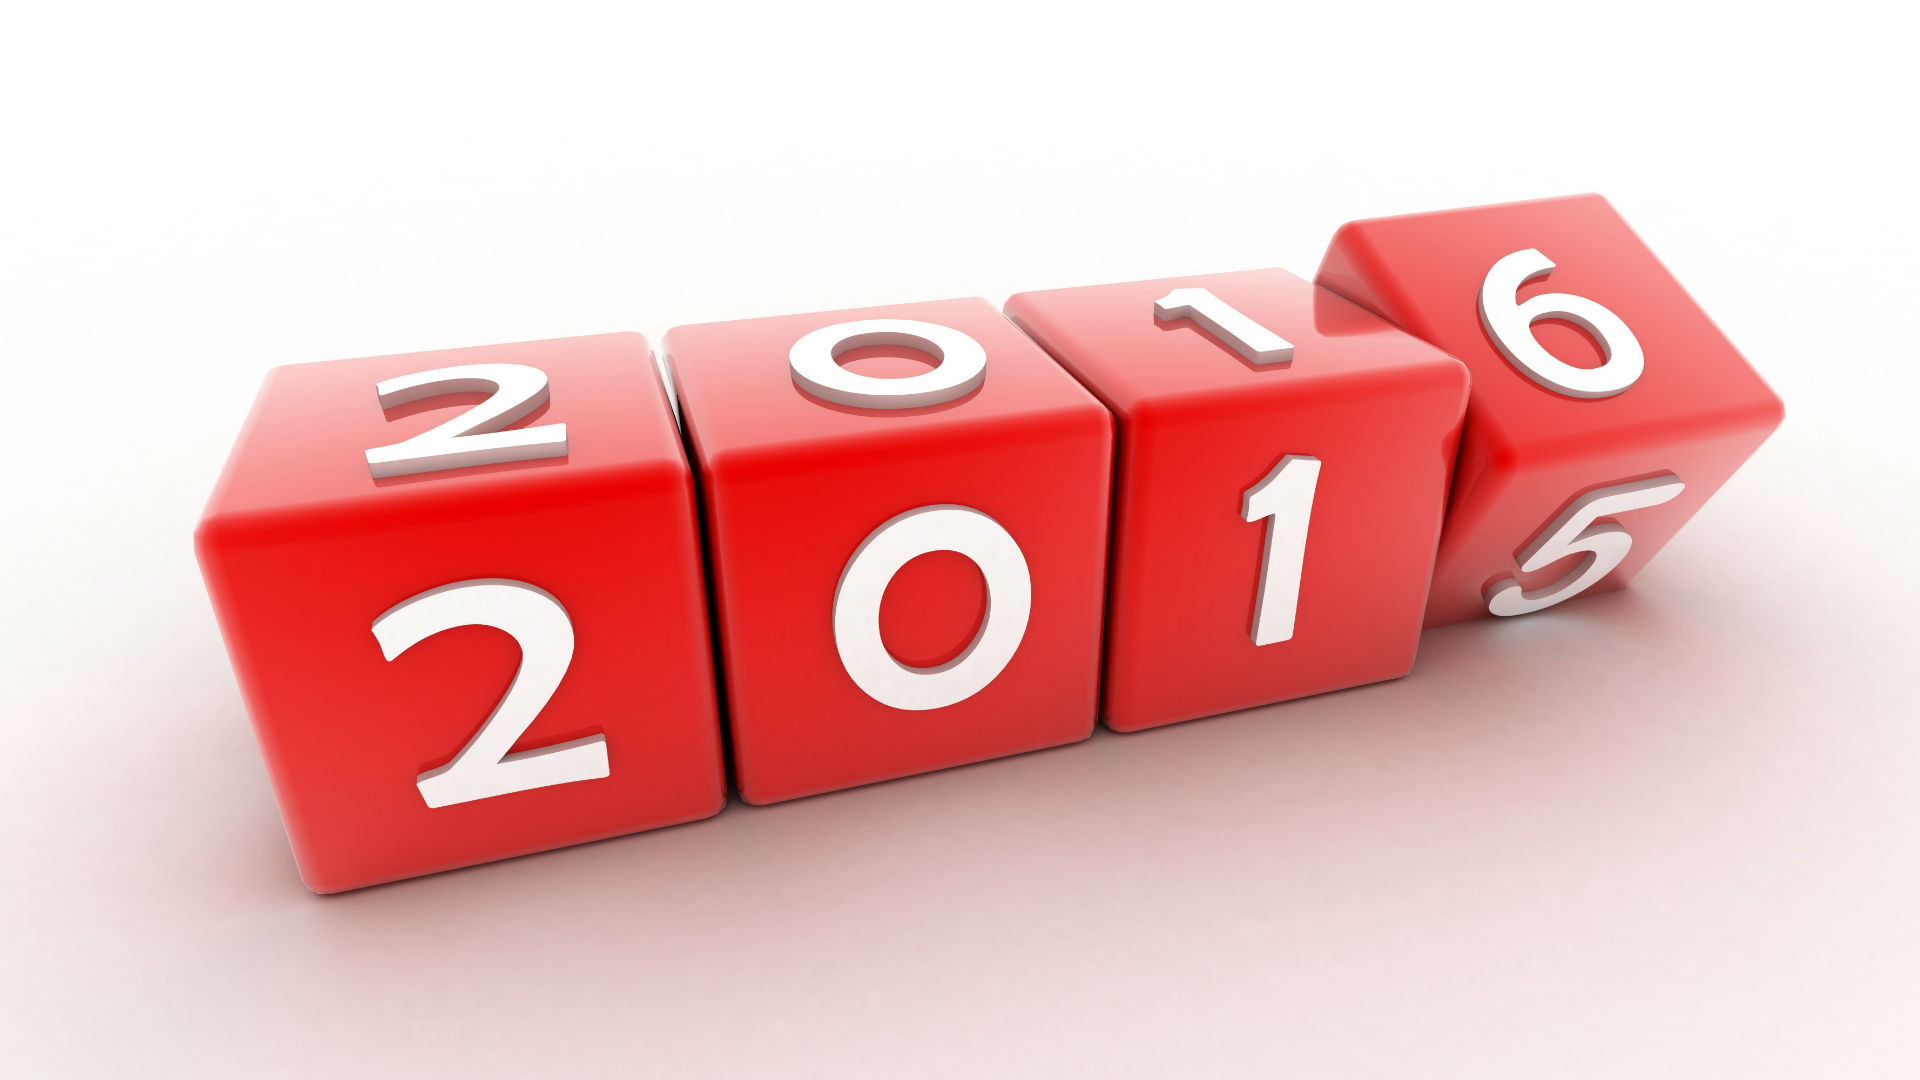 2016-new-year-ss-1920.jpg